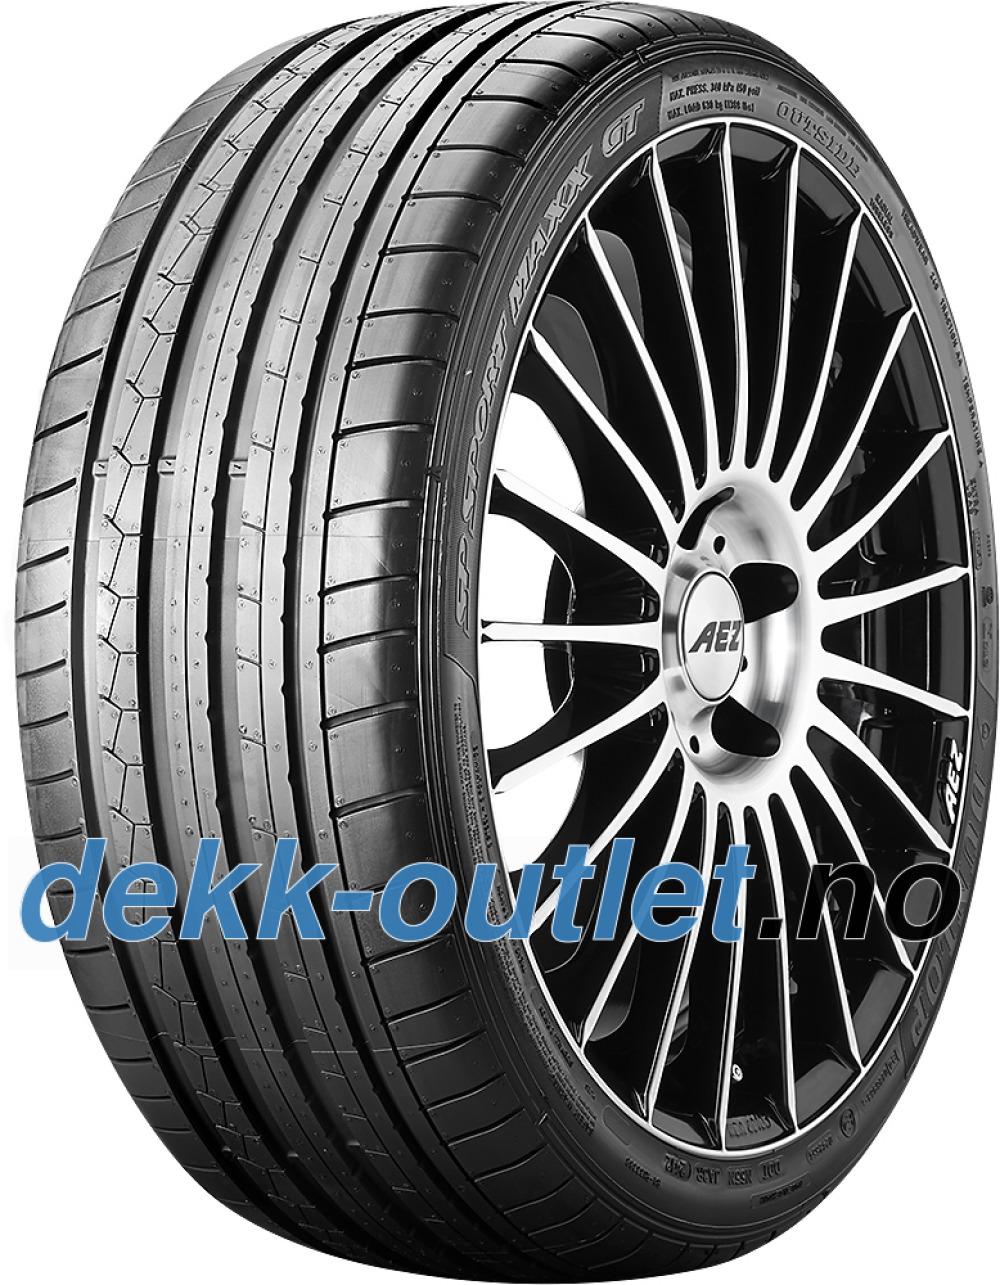 Dunlop SP Sport Maxx GT ( 295/25 ZR22 (97Y) XL med felgbeskyttelse (MFS) )